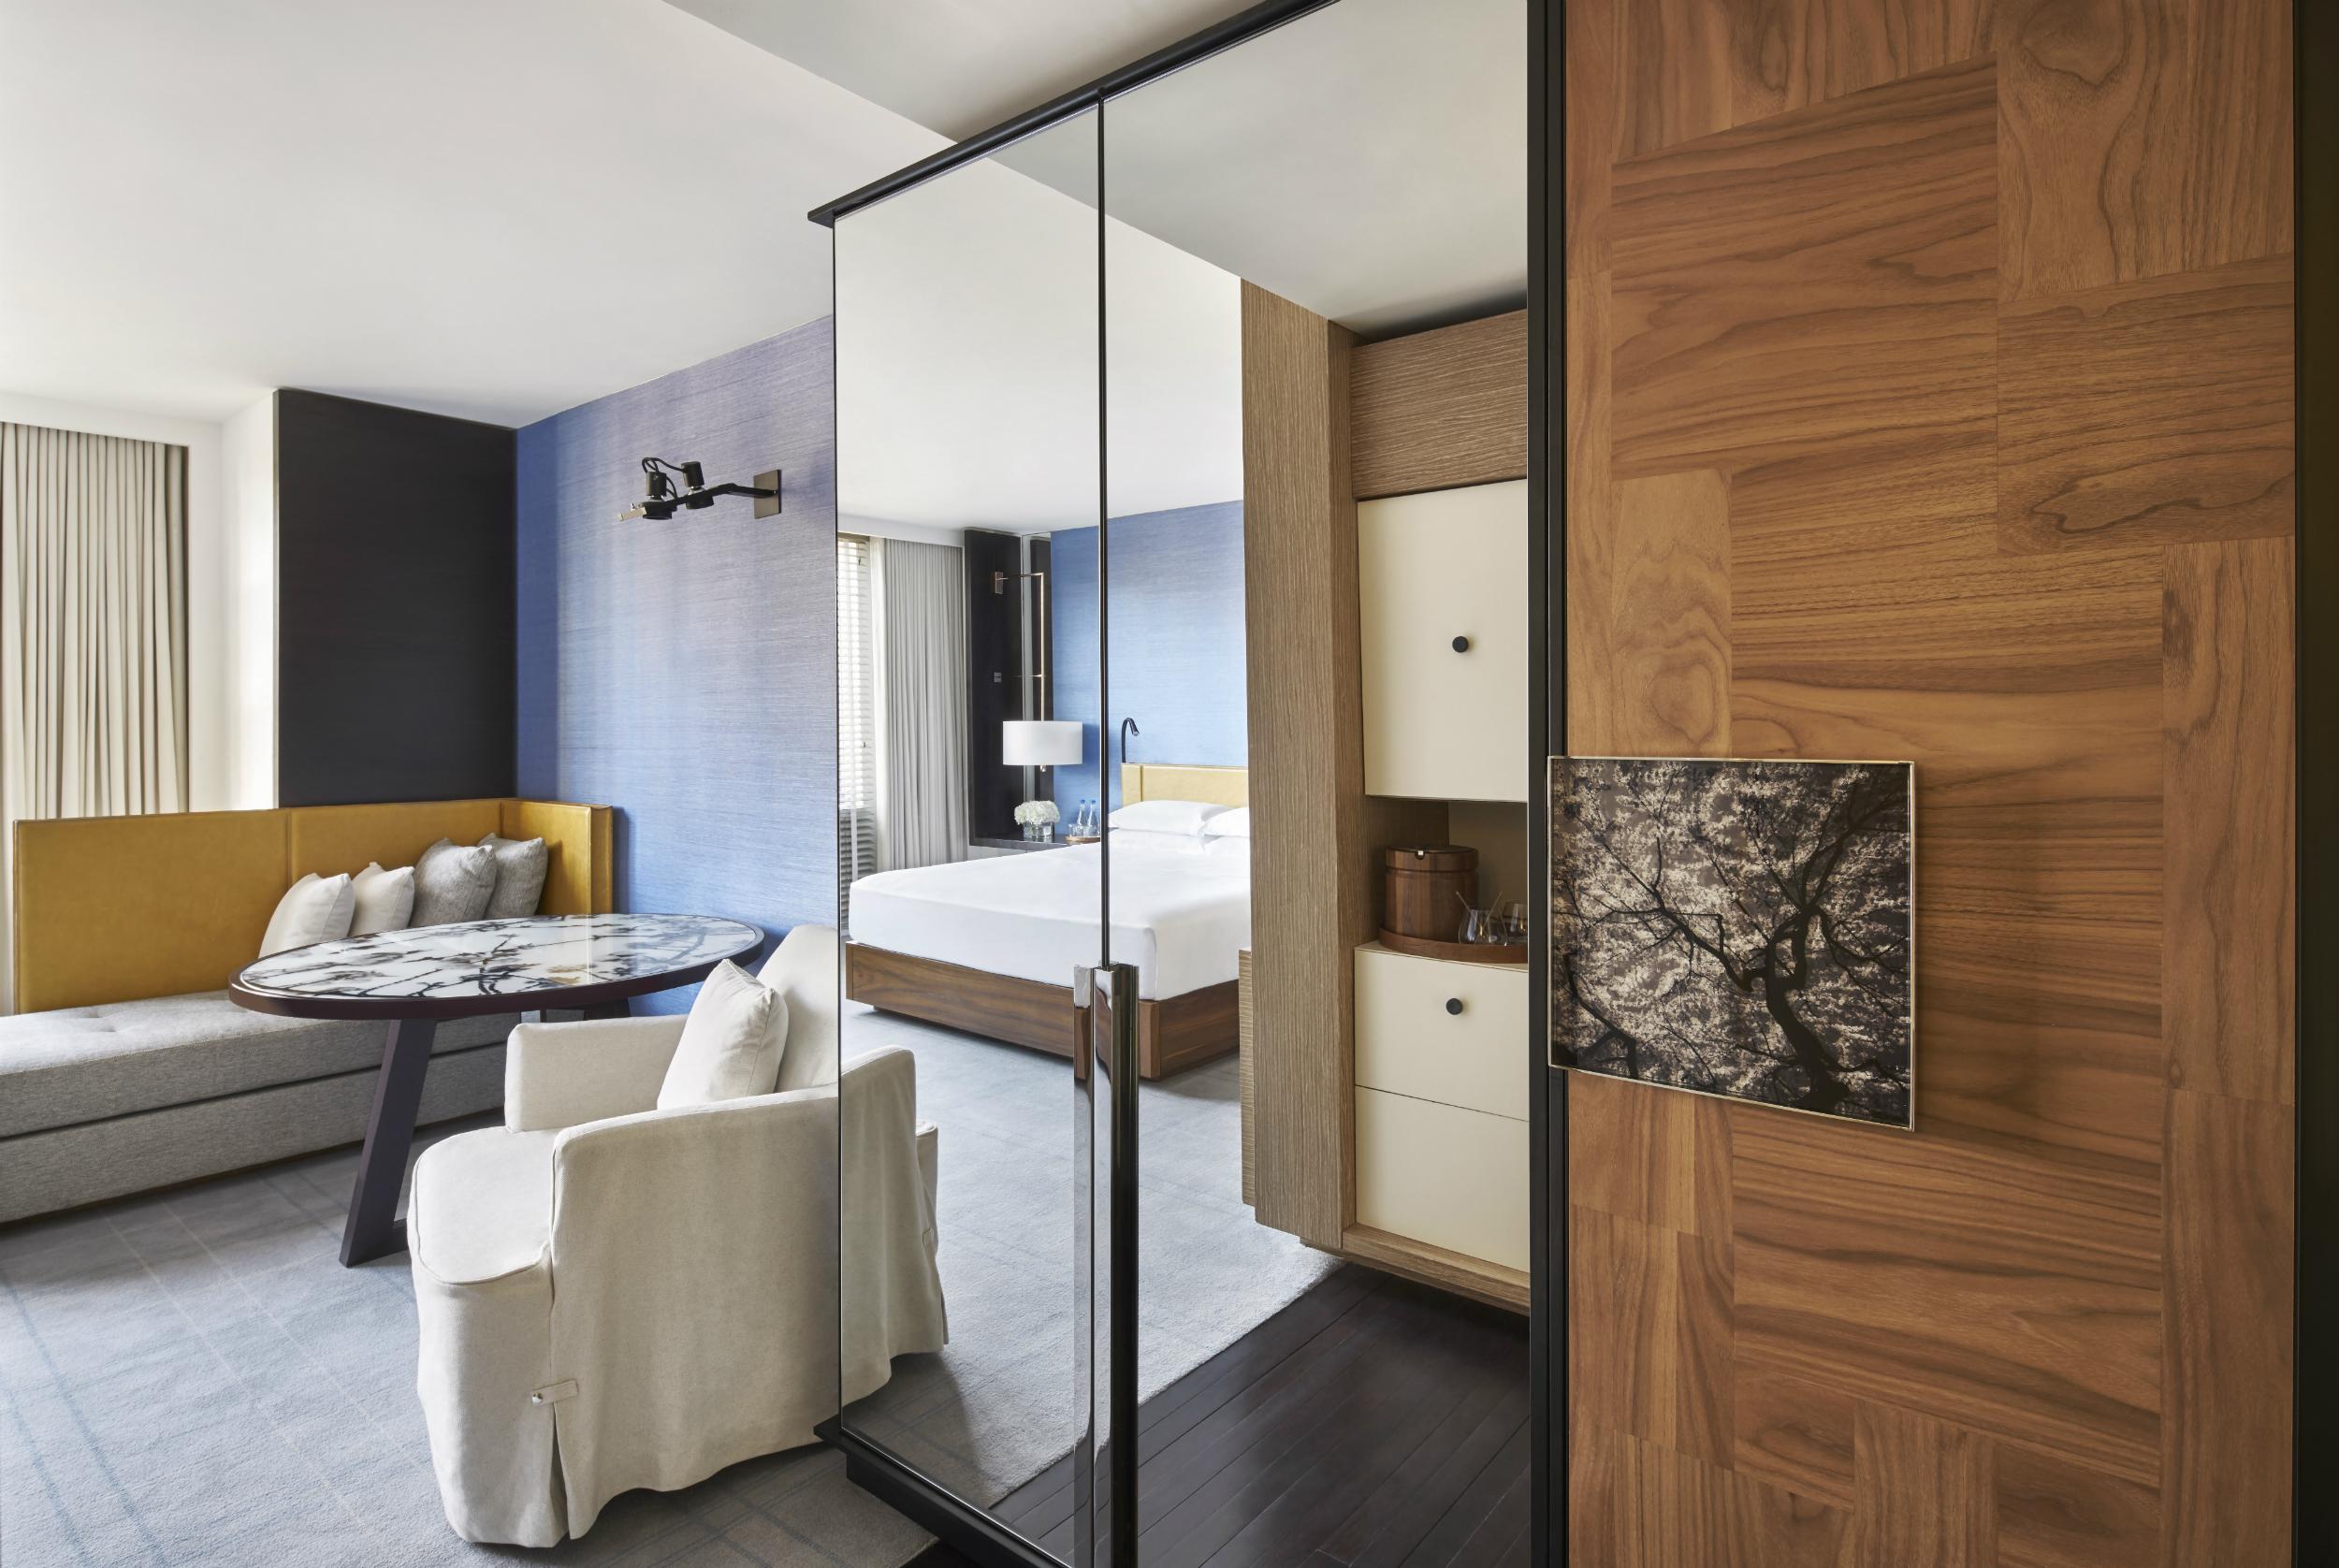 Park Hyatt deluxe king guestroom in Washington, DC